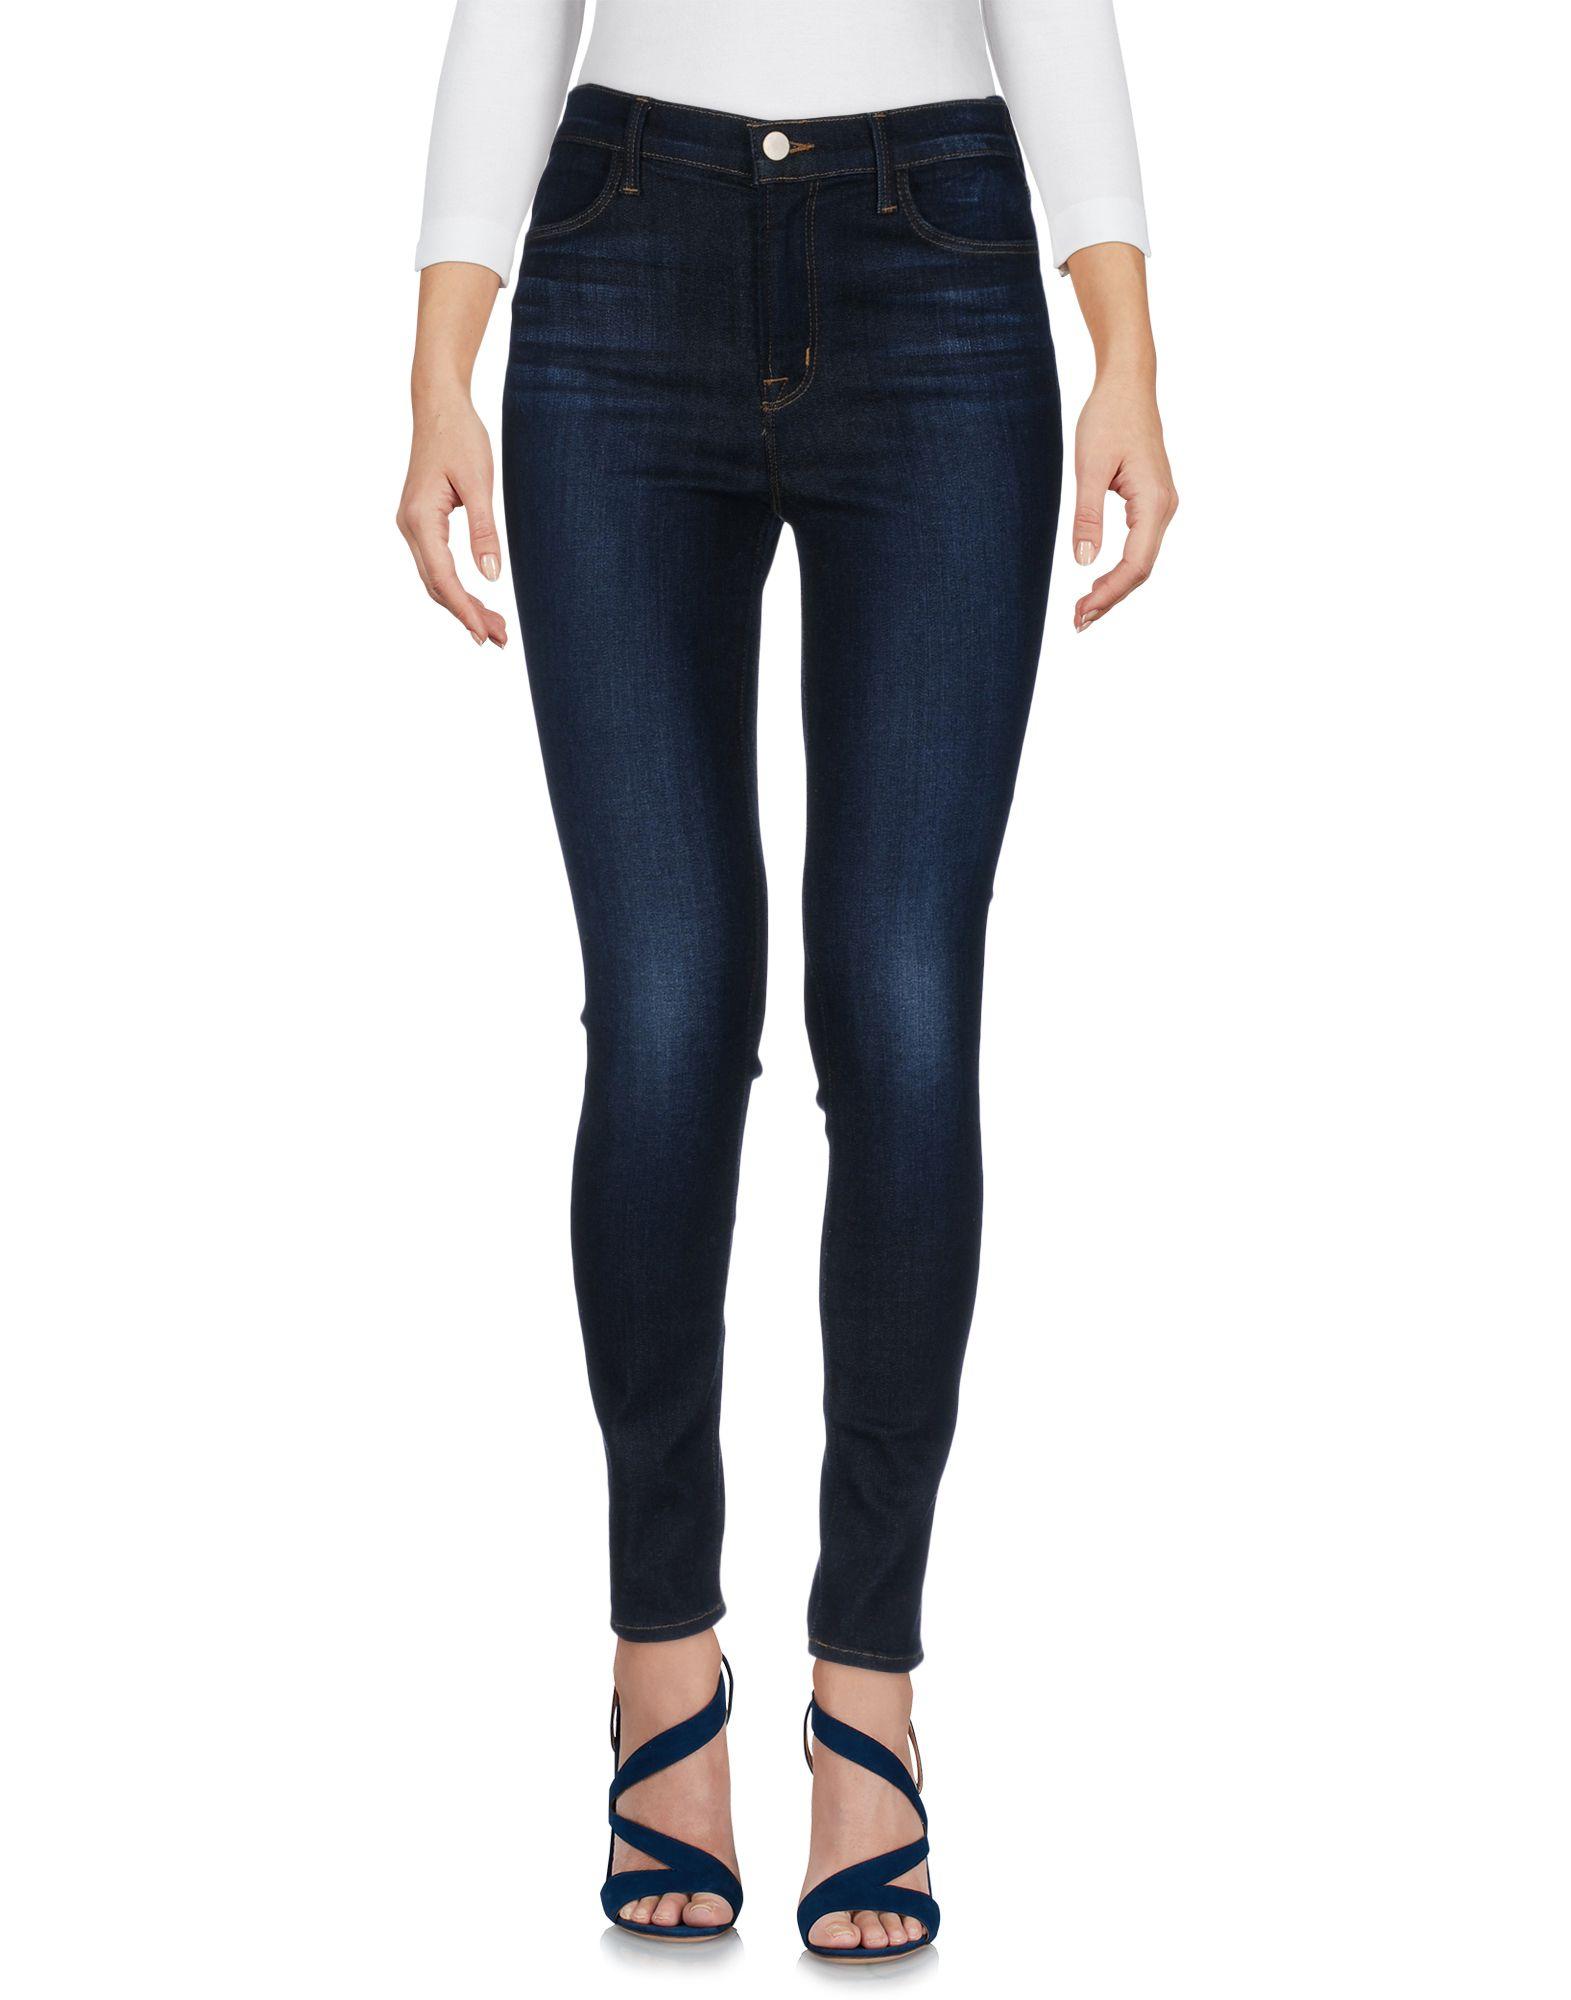 J BRAND Damen Jeanshose Farbe Blau Größe 7